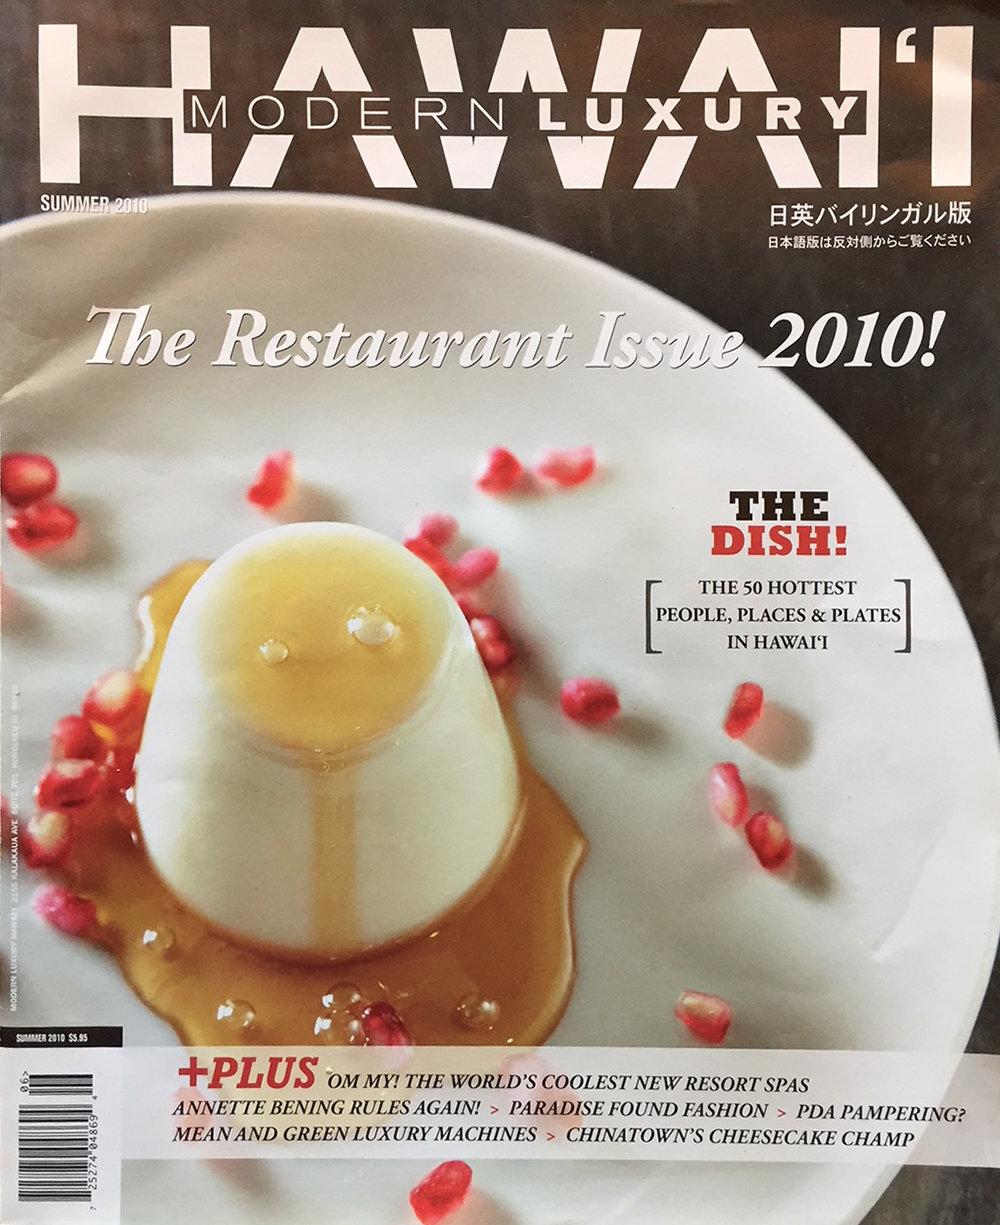 Modern Luxury Hawaii Magazine